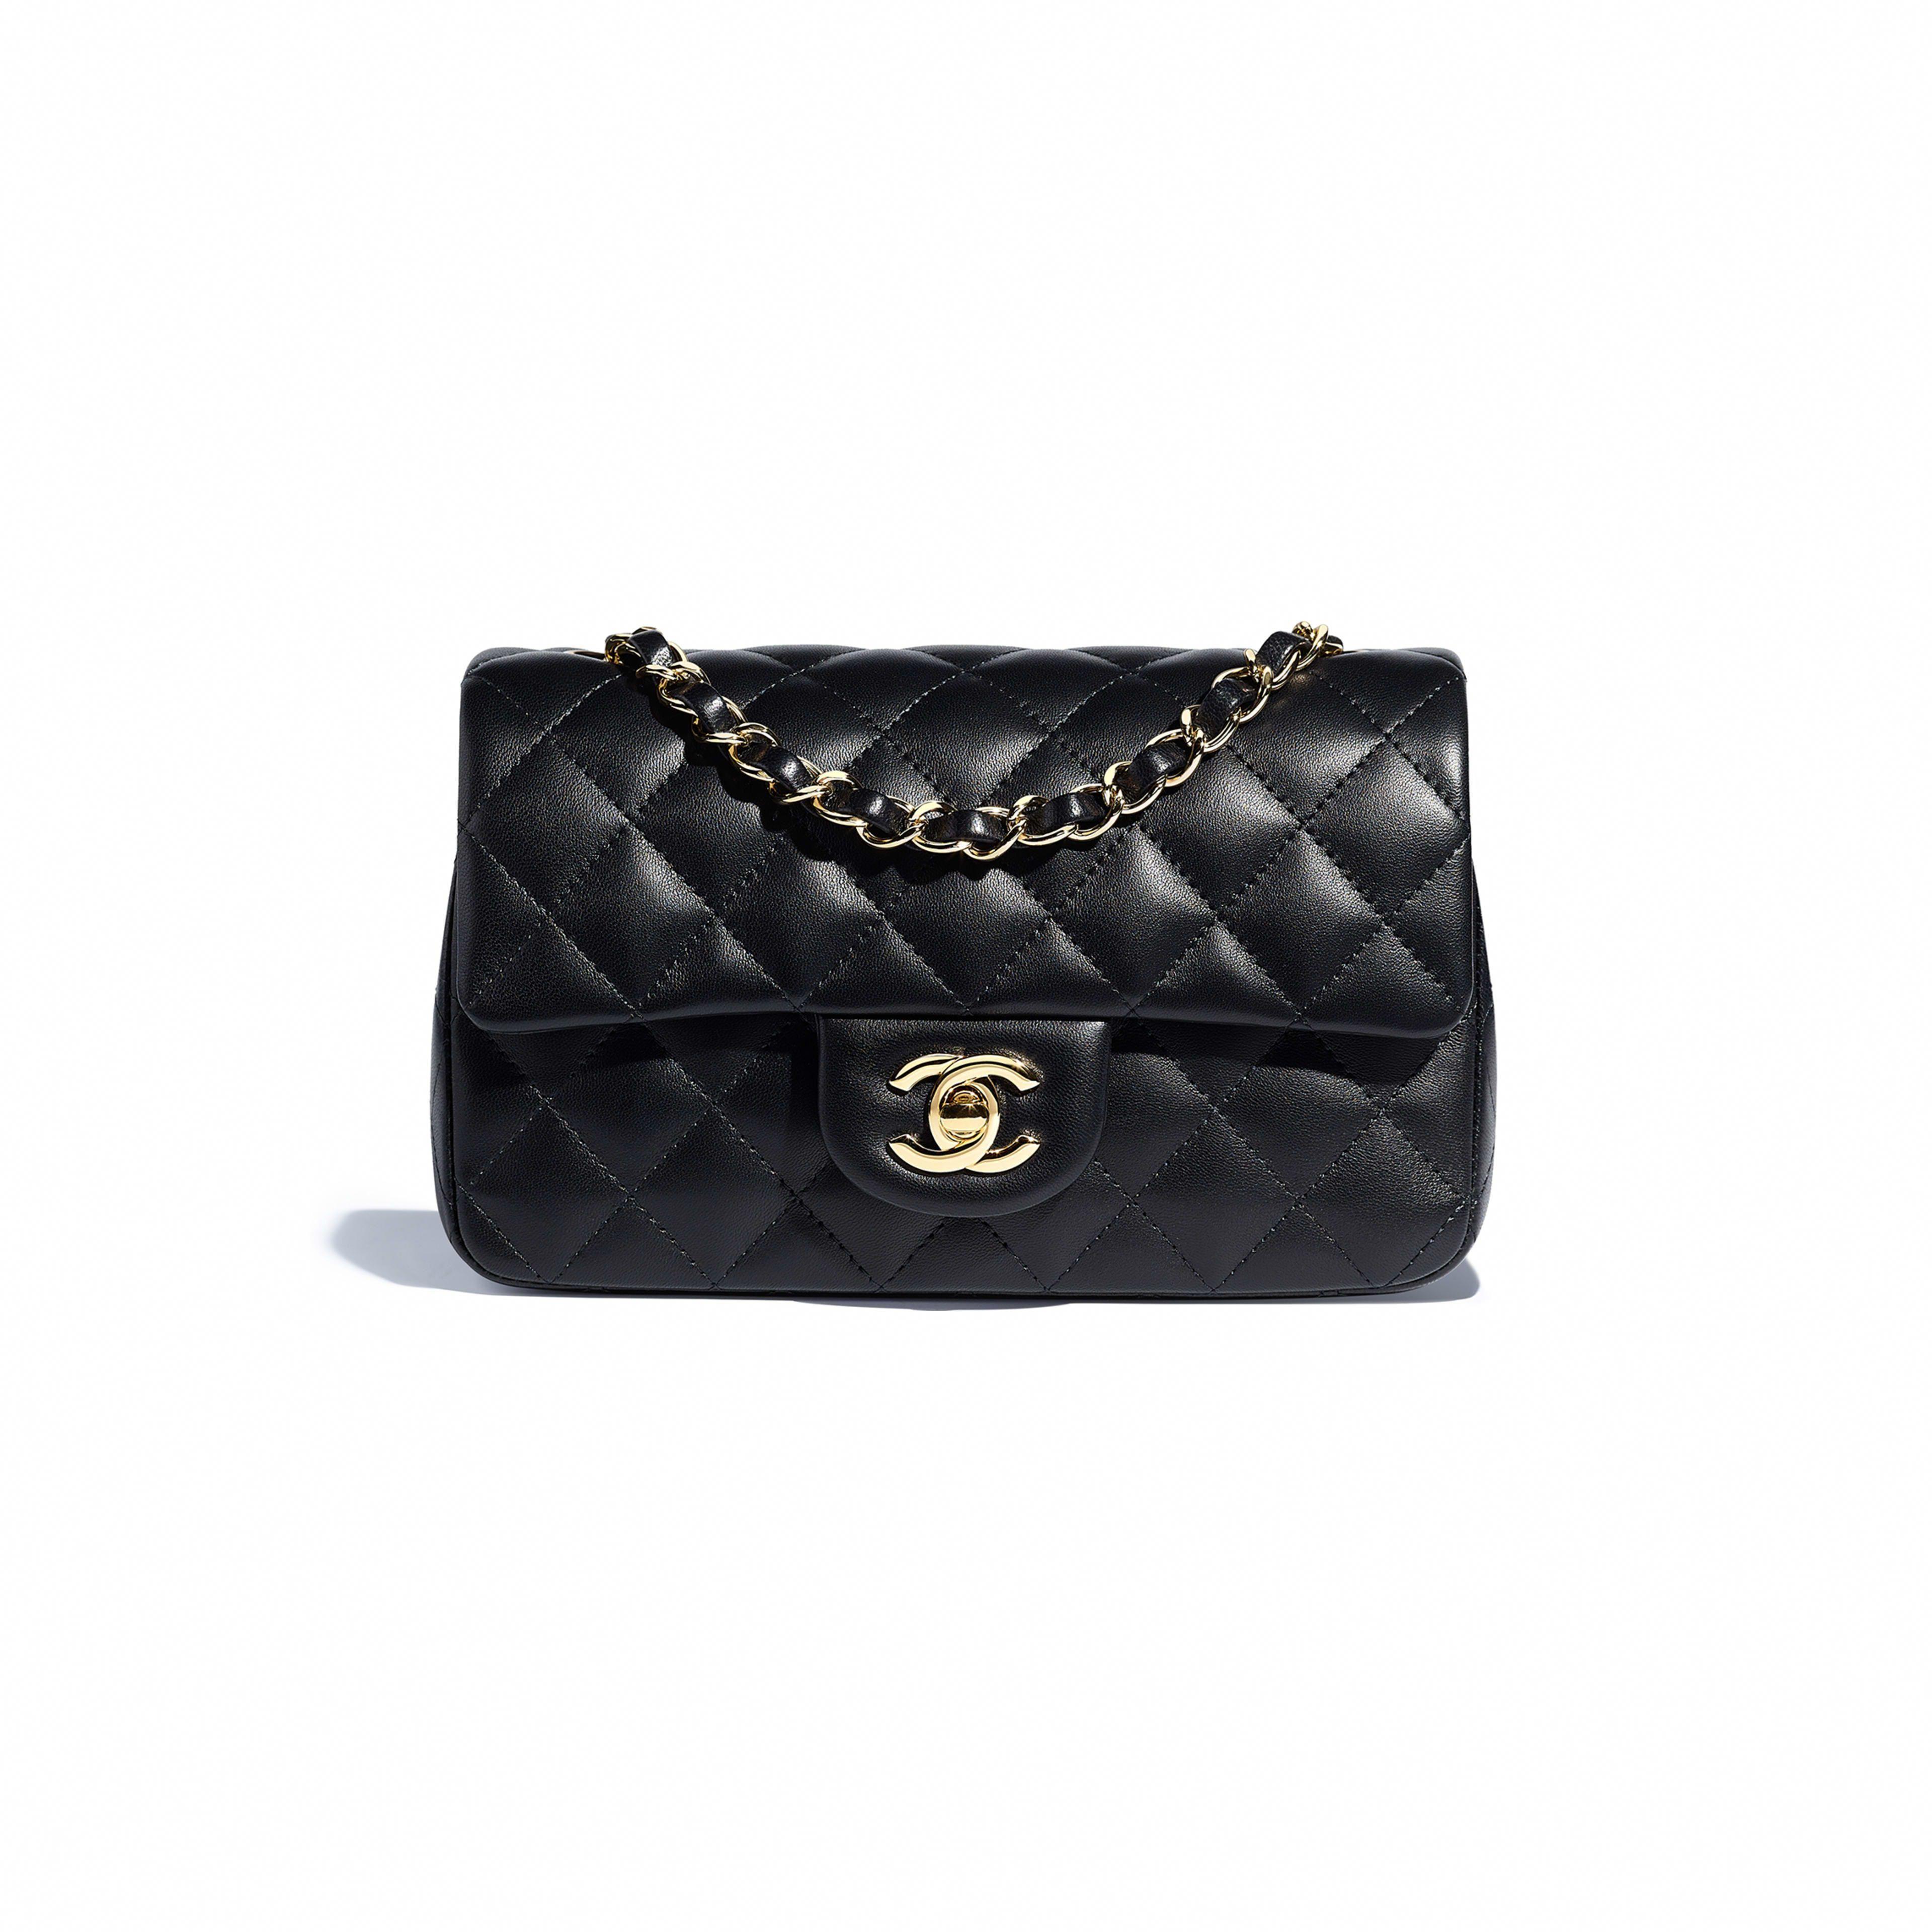 936f6d69d6ad CHANEL Mini Flap Bag Lambskin & Gold-Tone Metal Ref. A69900 Y04059 94305  $3,300 Dimensions 12.5 x 20 x 7 cm ( in ) Lambskin & Gold-Tone Metal Color  Black # ...